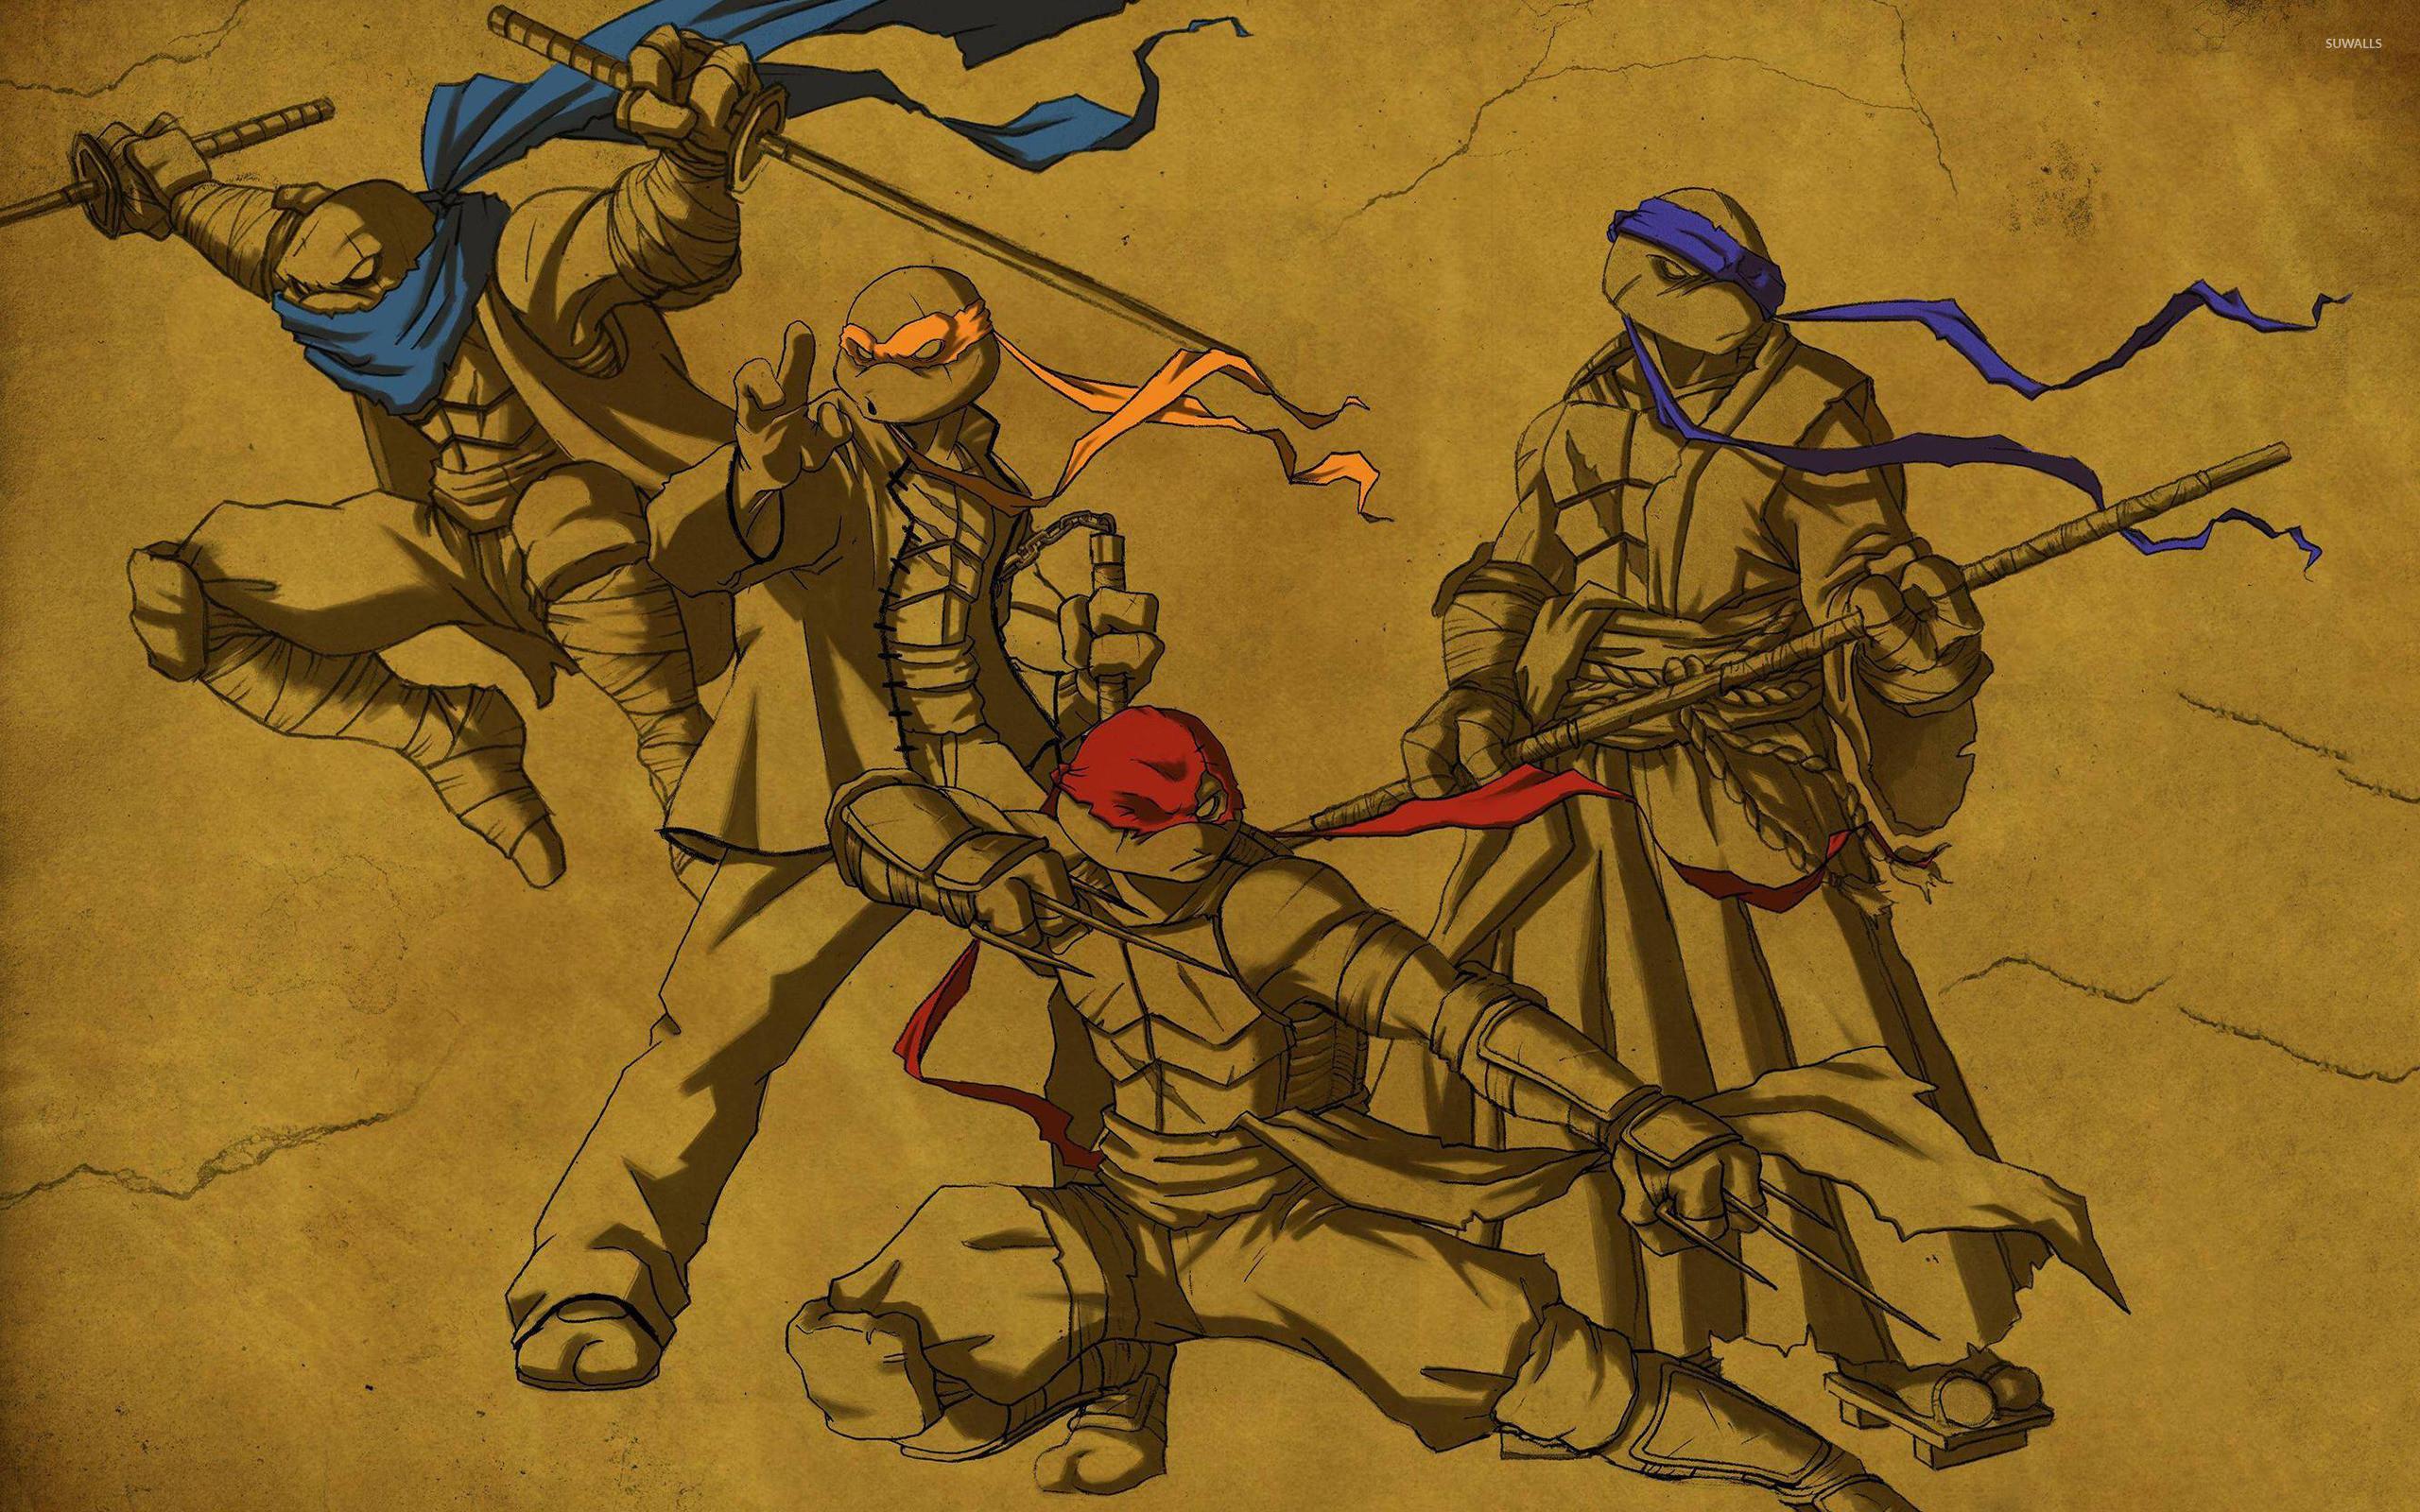 Ninja Turtles Wallpaper For Android With A Bright Color Ninja · NinjasTeenage  Mutant …